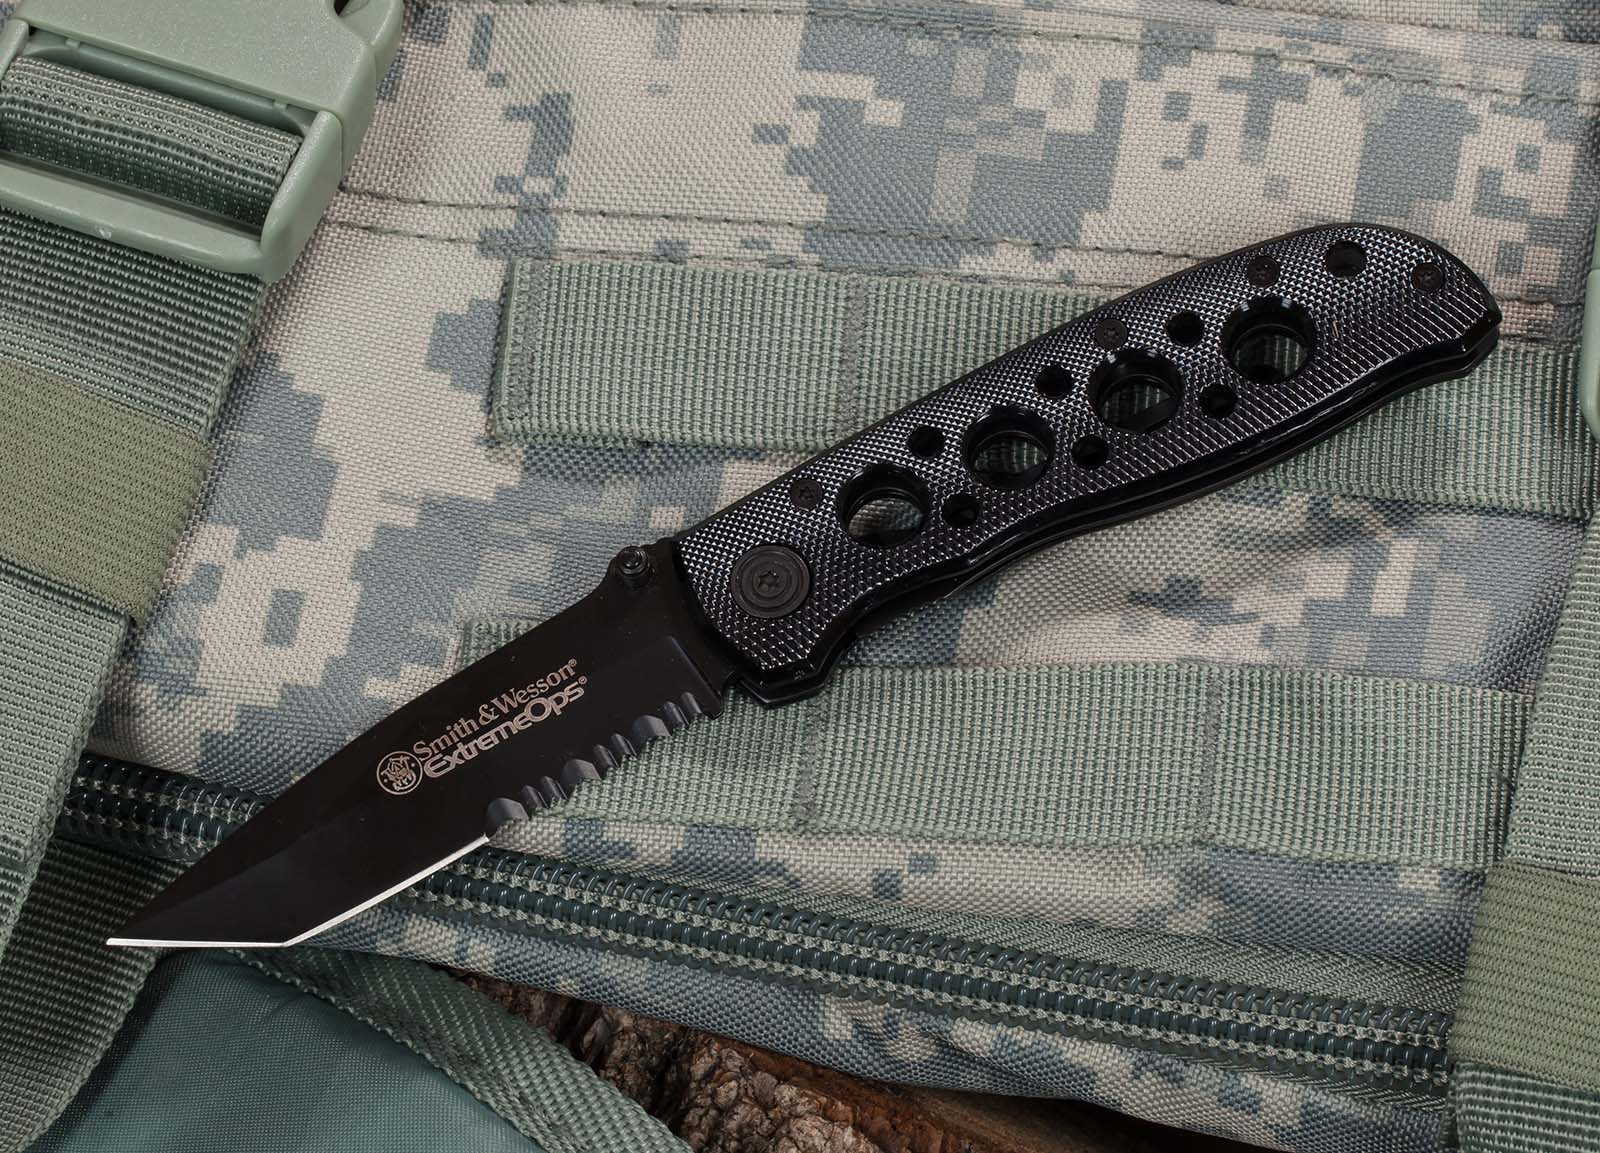 Складной нож танто Smith & Wesson Extreme Ops CK5TBS